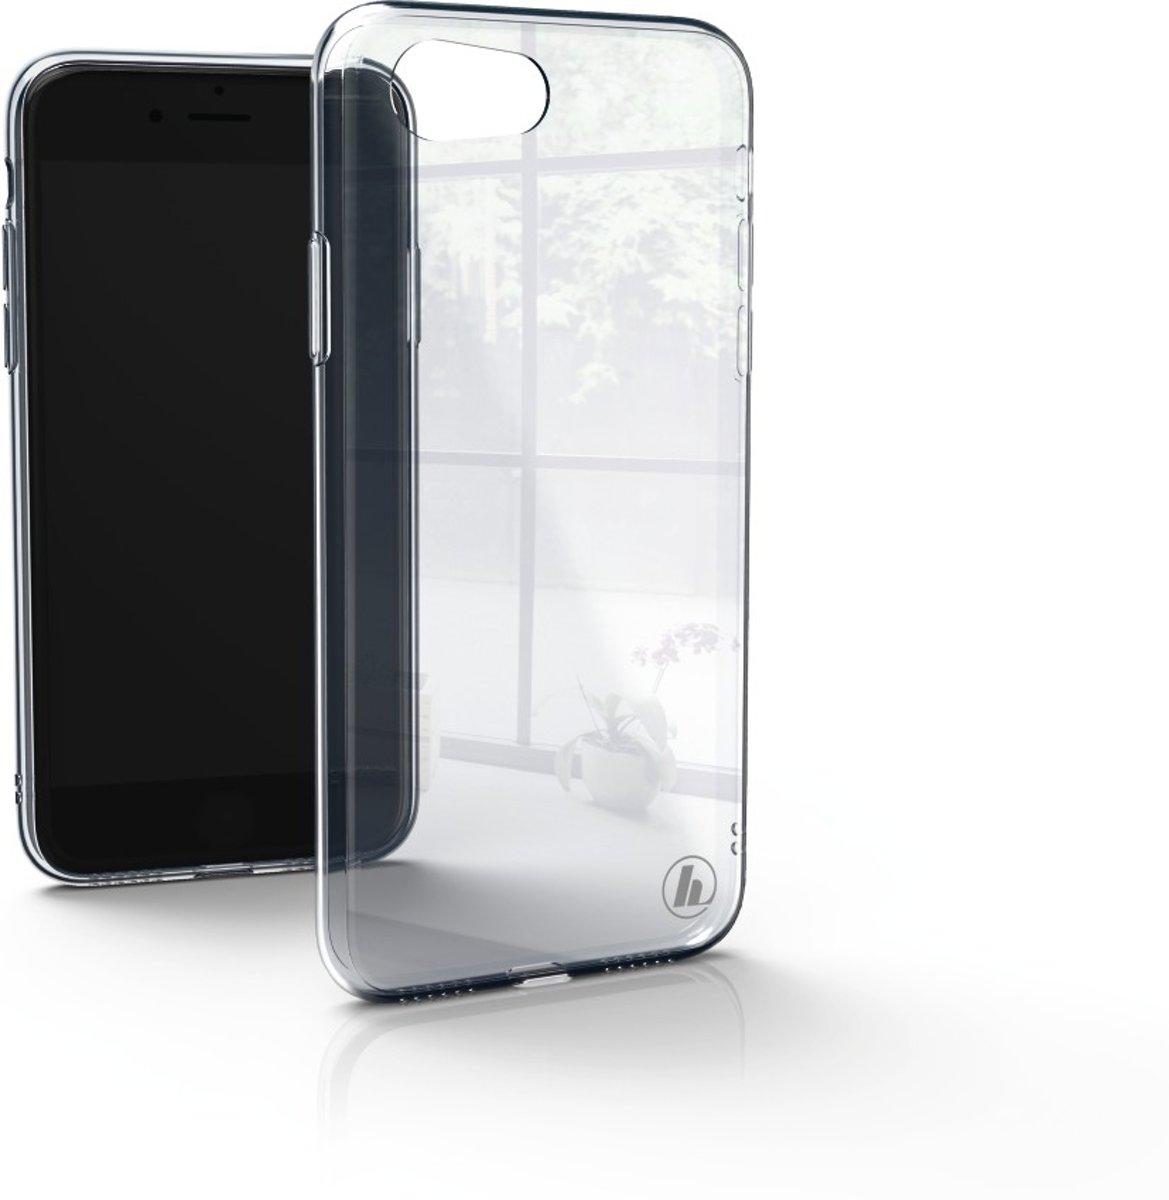 Hama Glass GSM backcover Geschikt voor model (GSMs): Apple iPhone 7, Apple iPhone 8 Transparant